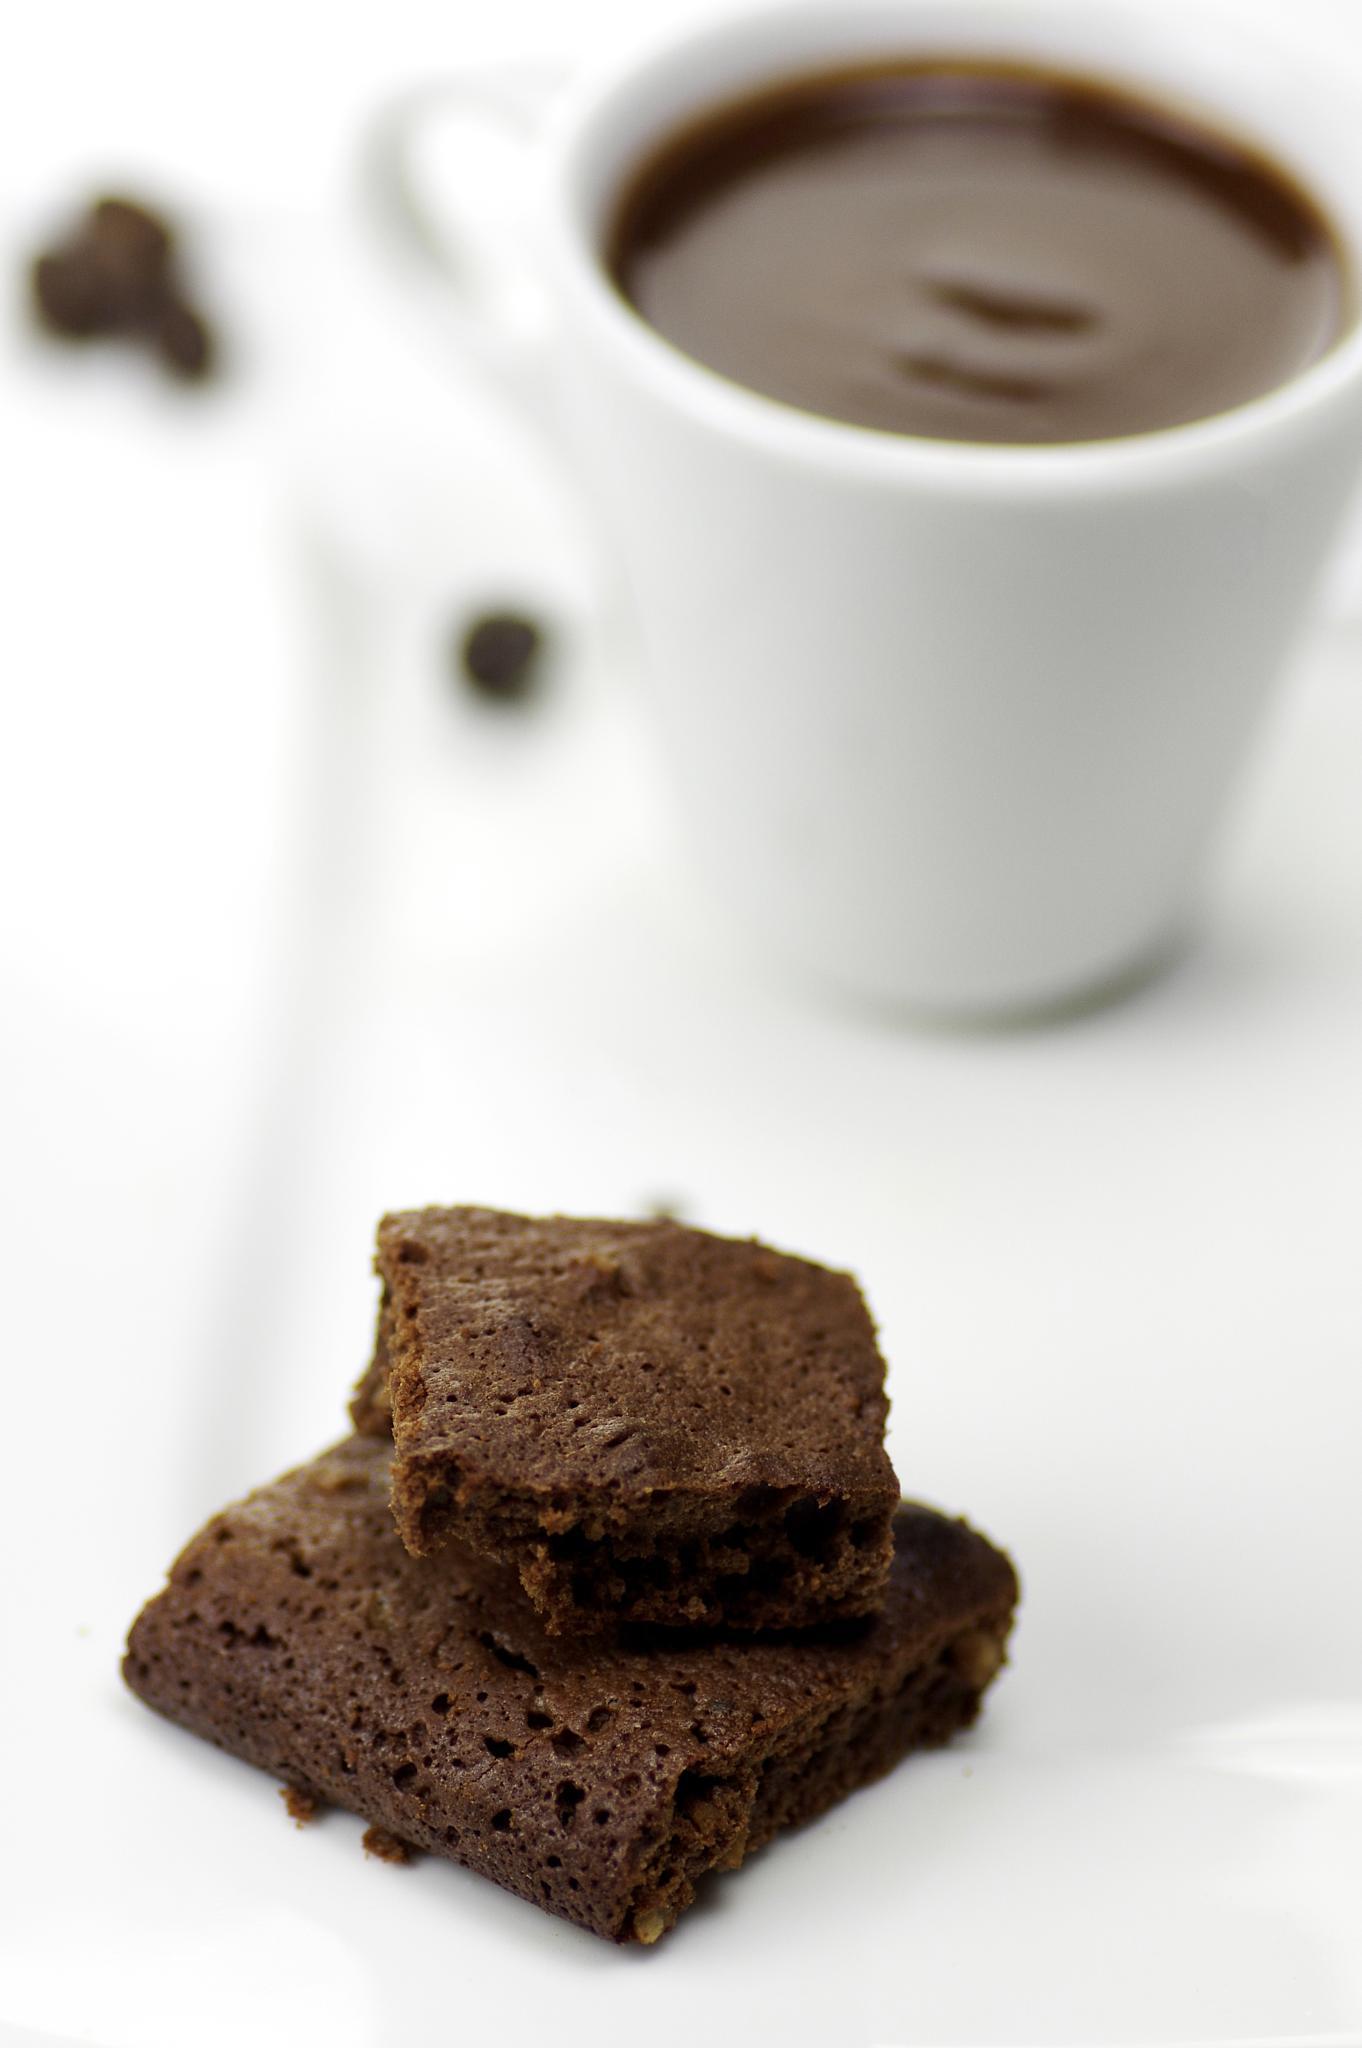 Schokoplätzchen mit feinem Kakao / Chocolate Cookies with fine cocoa by AvianaArt